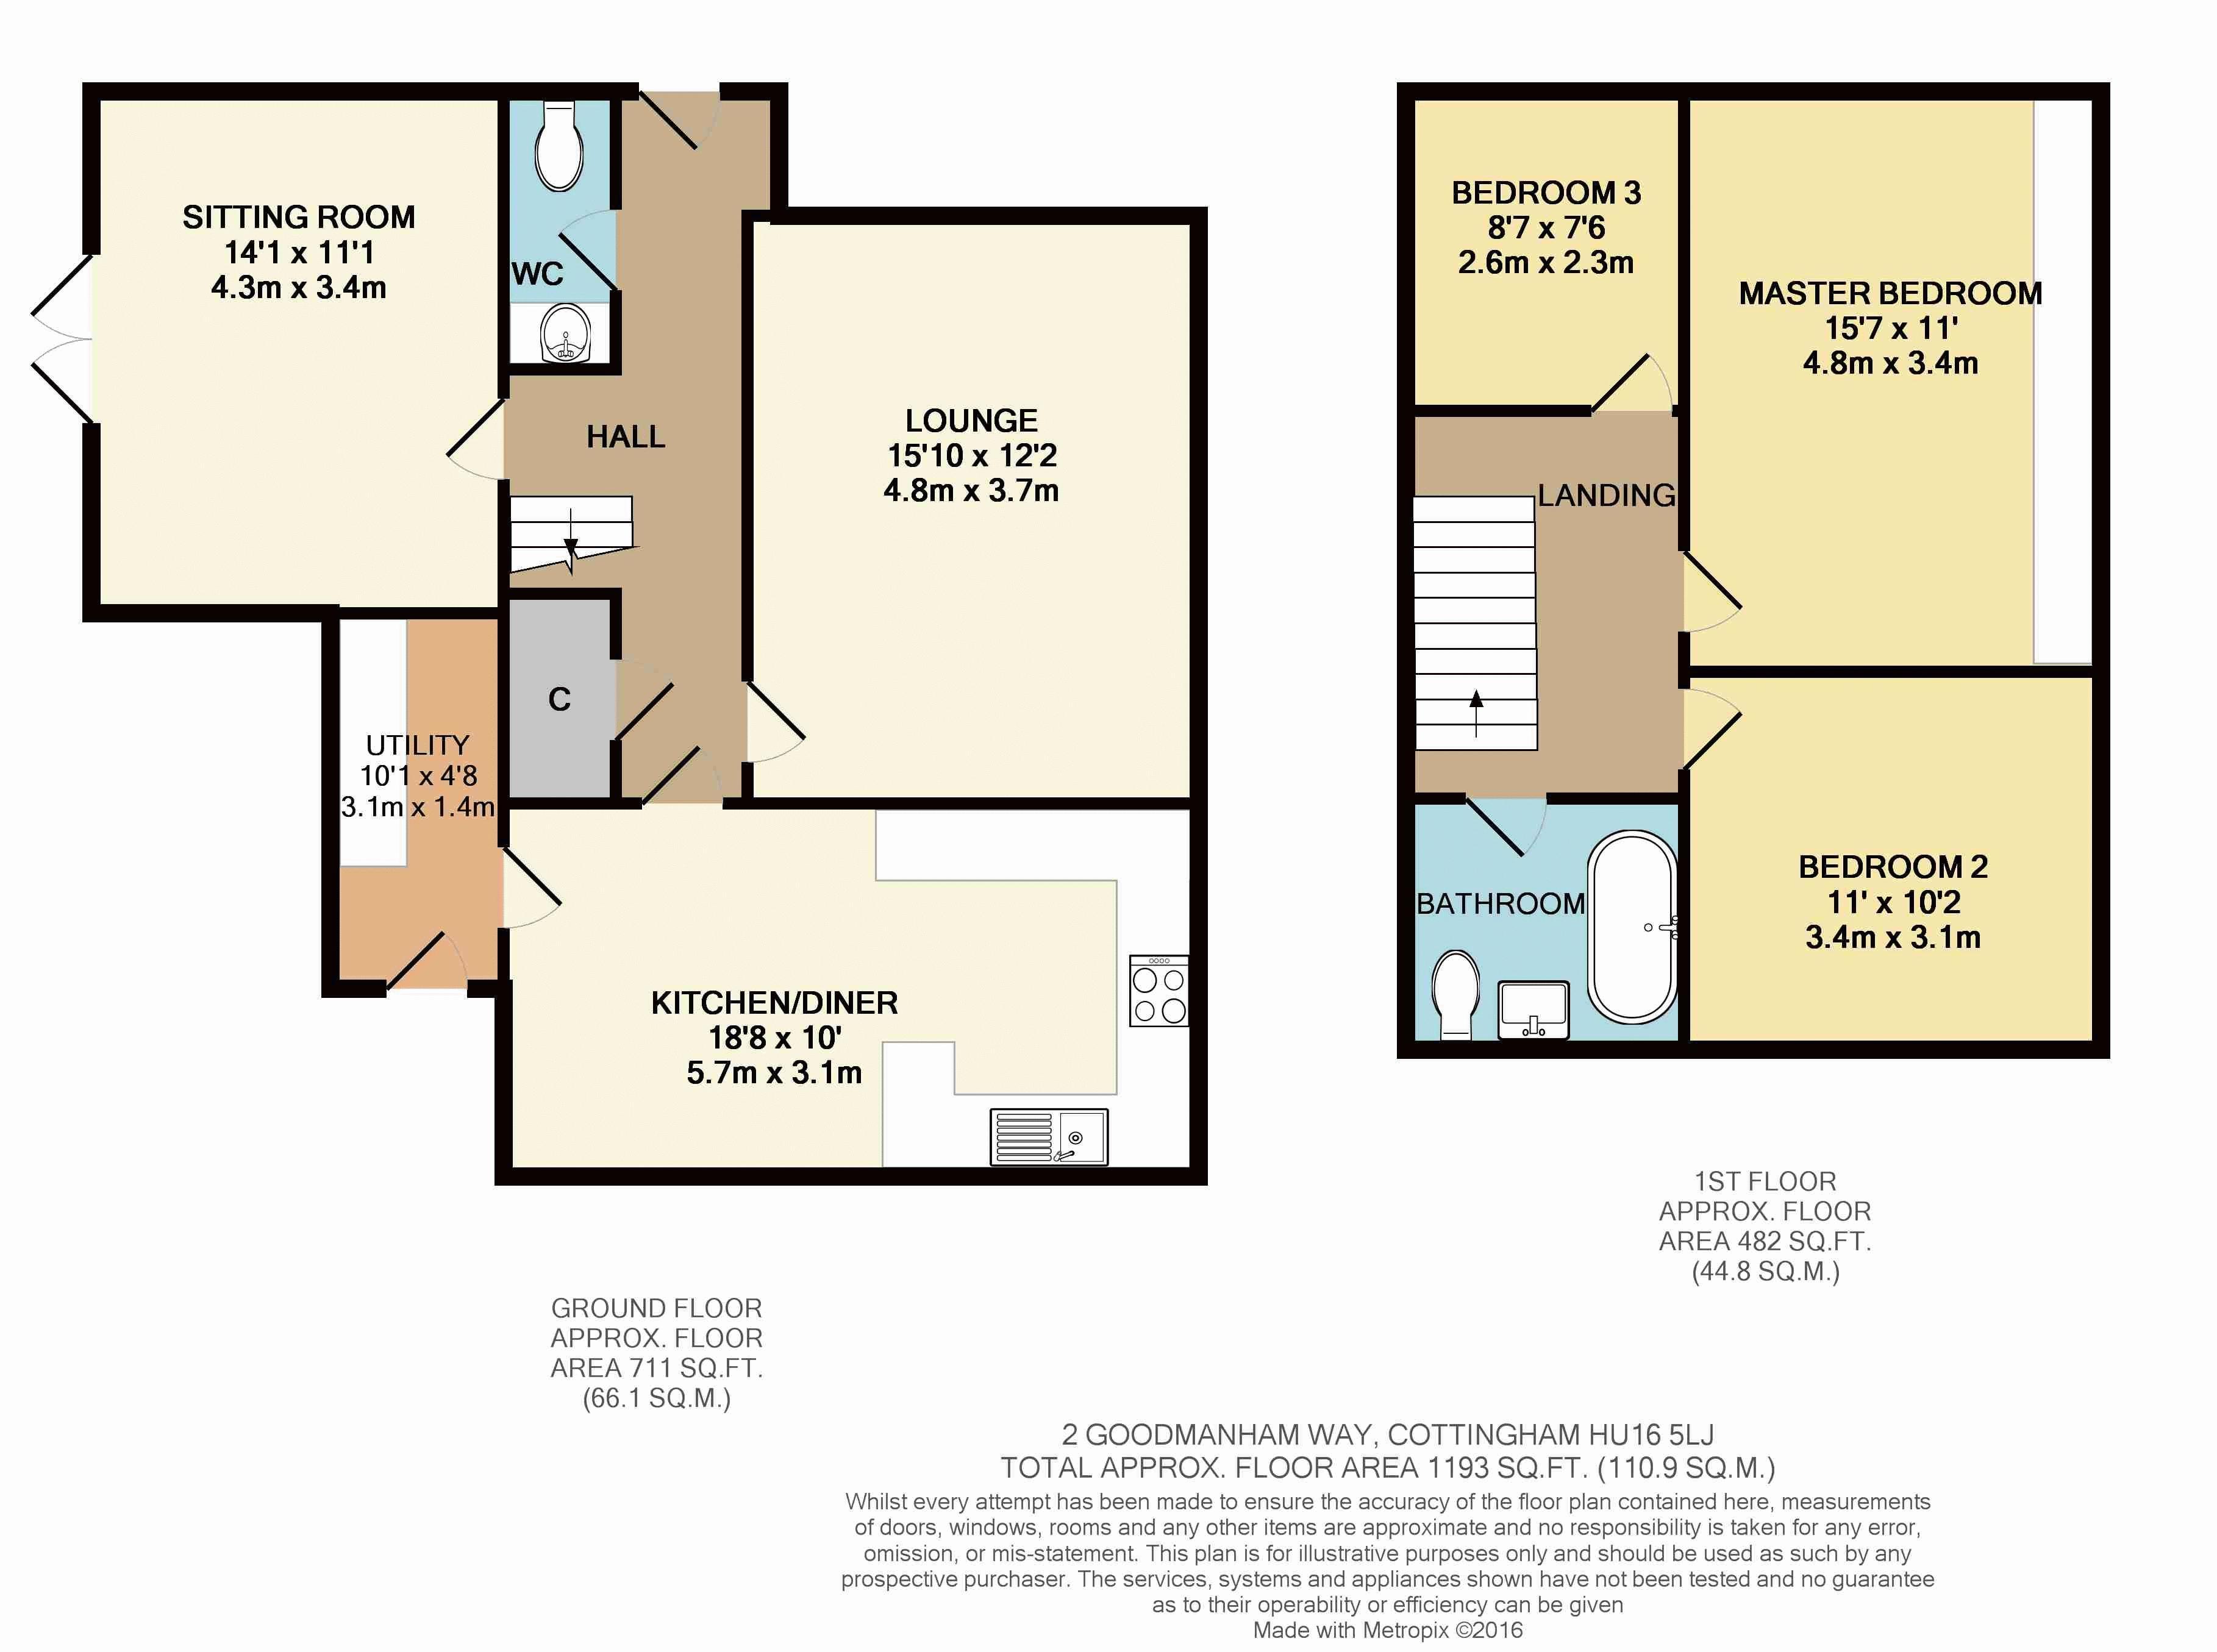 Bathroom Floor Plans For 10x10 : Bathroom floor plans selling my hampton